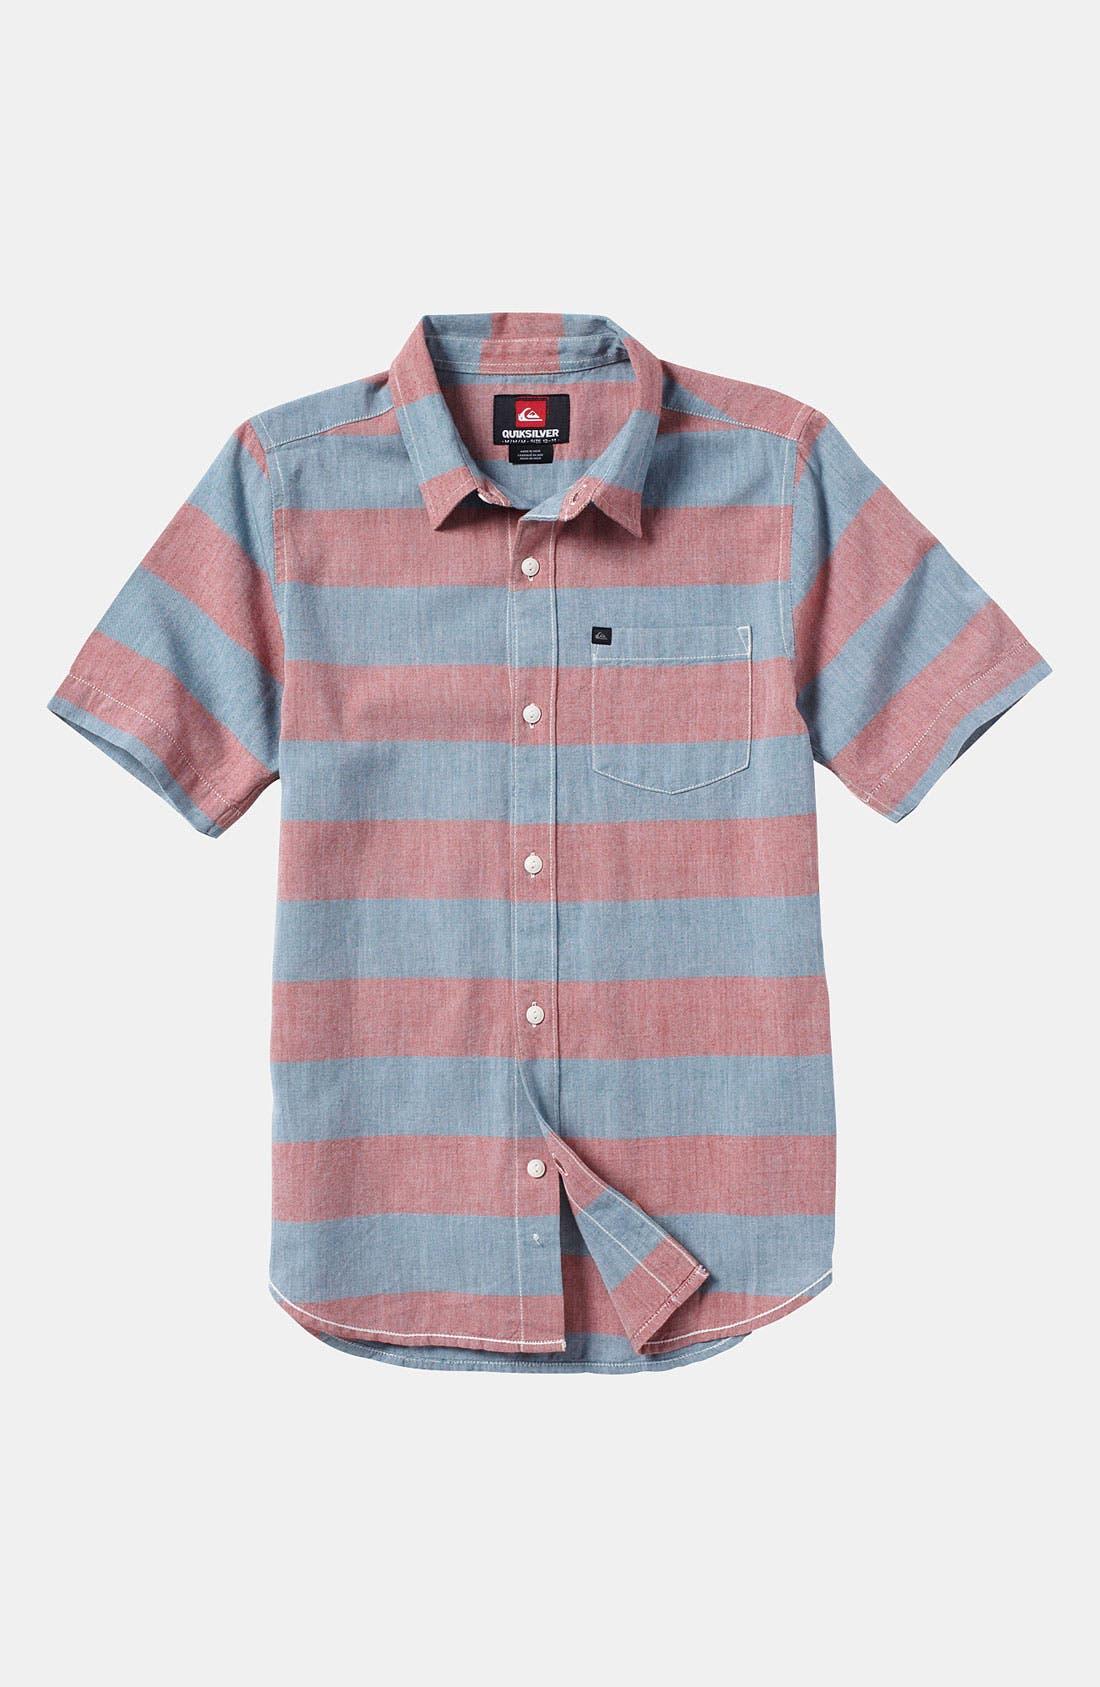 Main Image - Quiksilver 'Tube Prison' Woven Shirt (Big Boys)